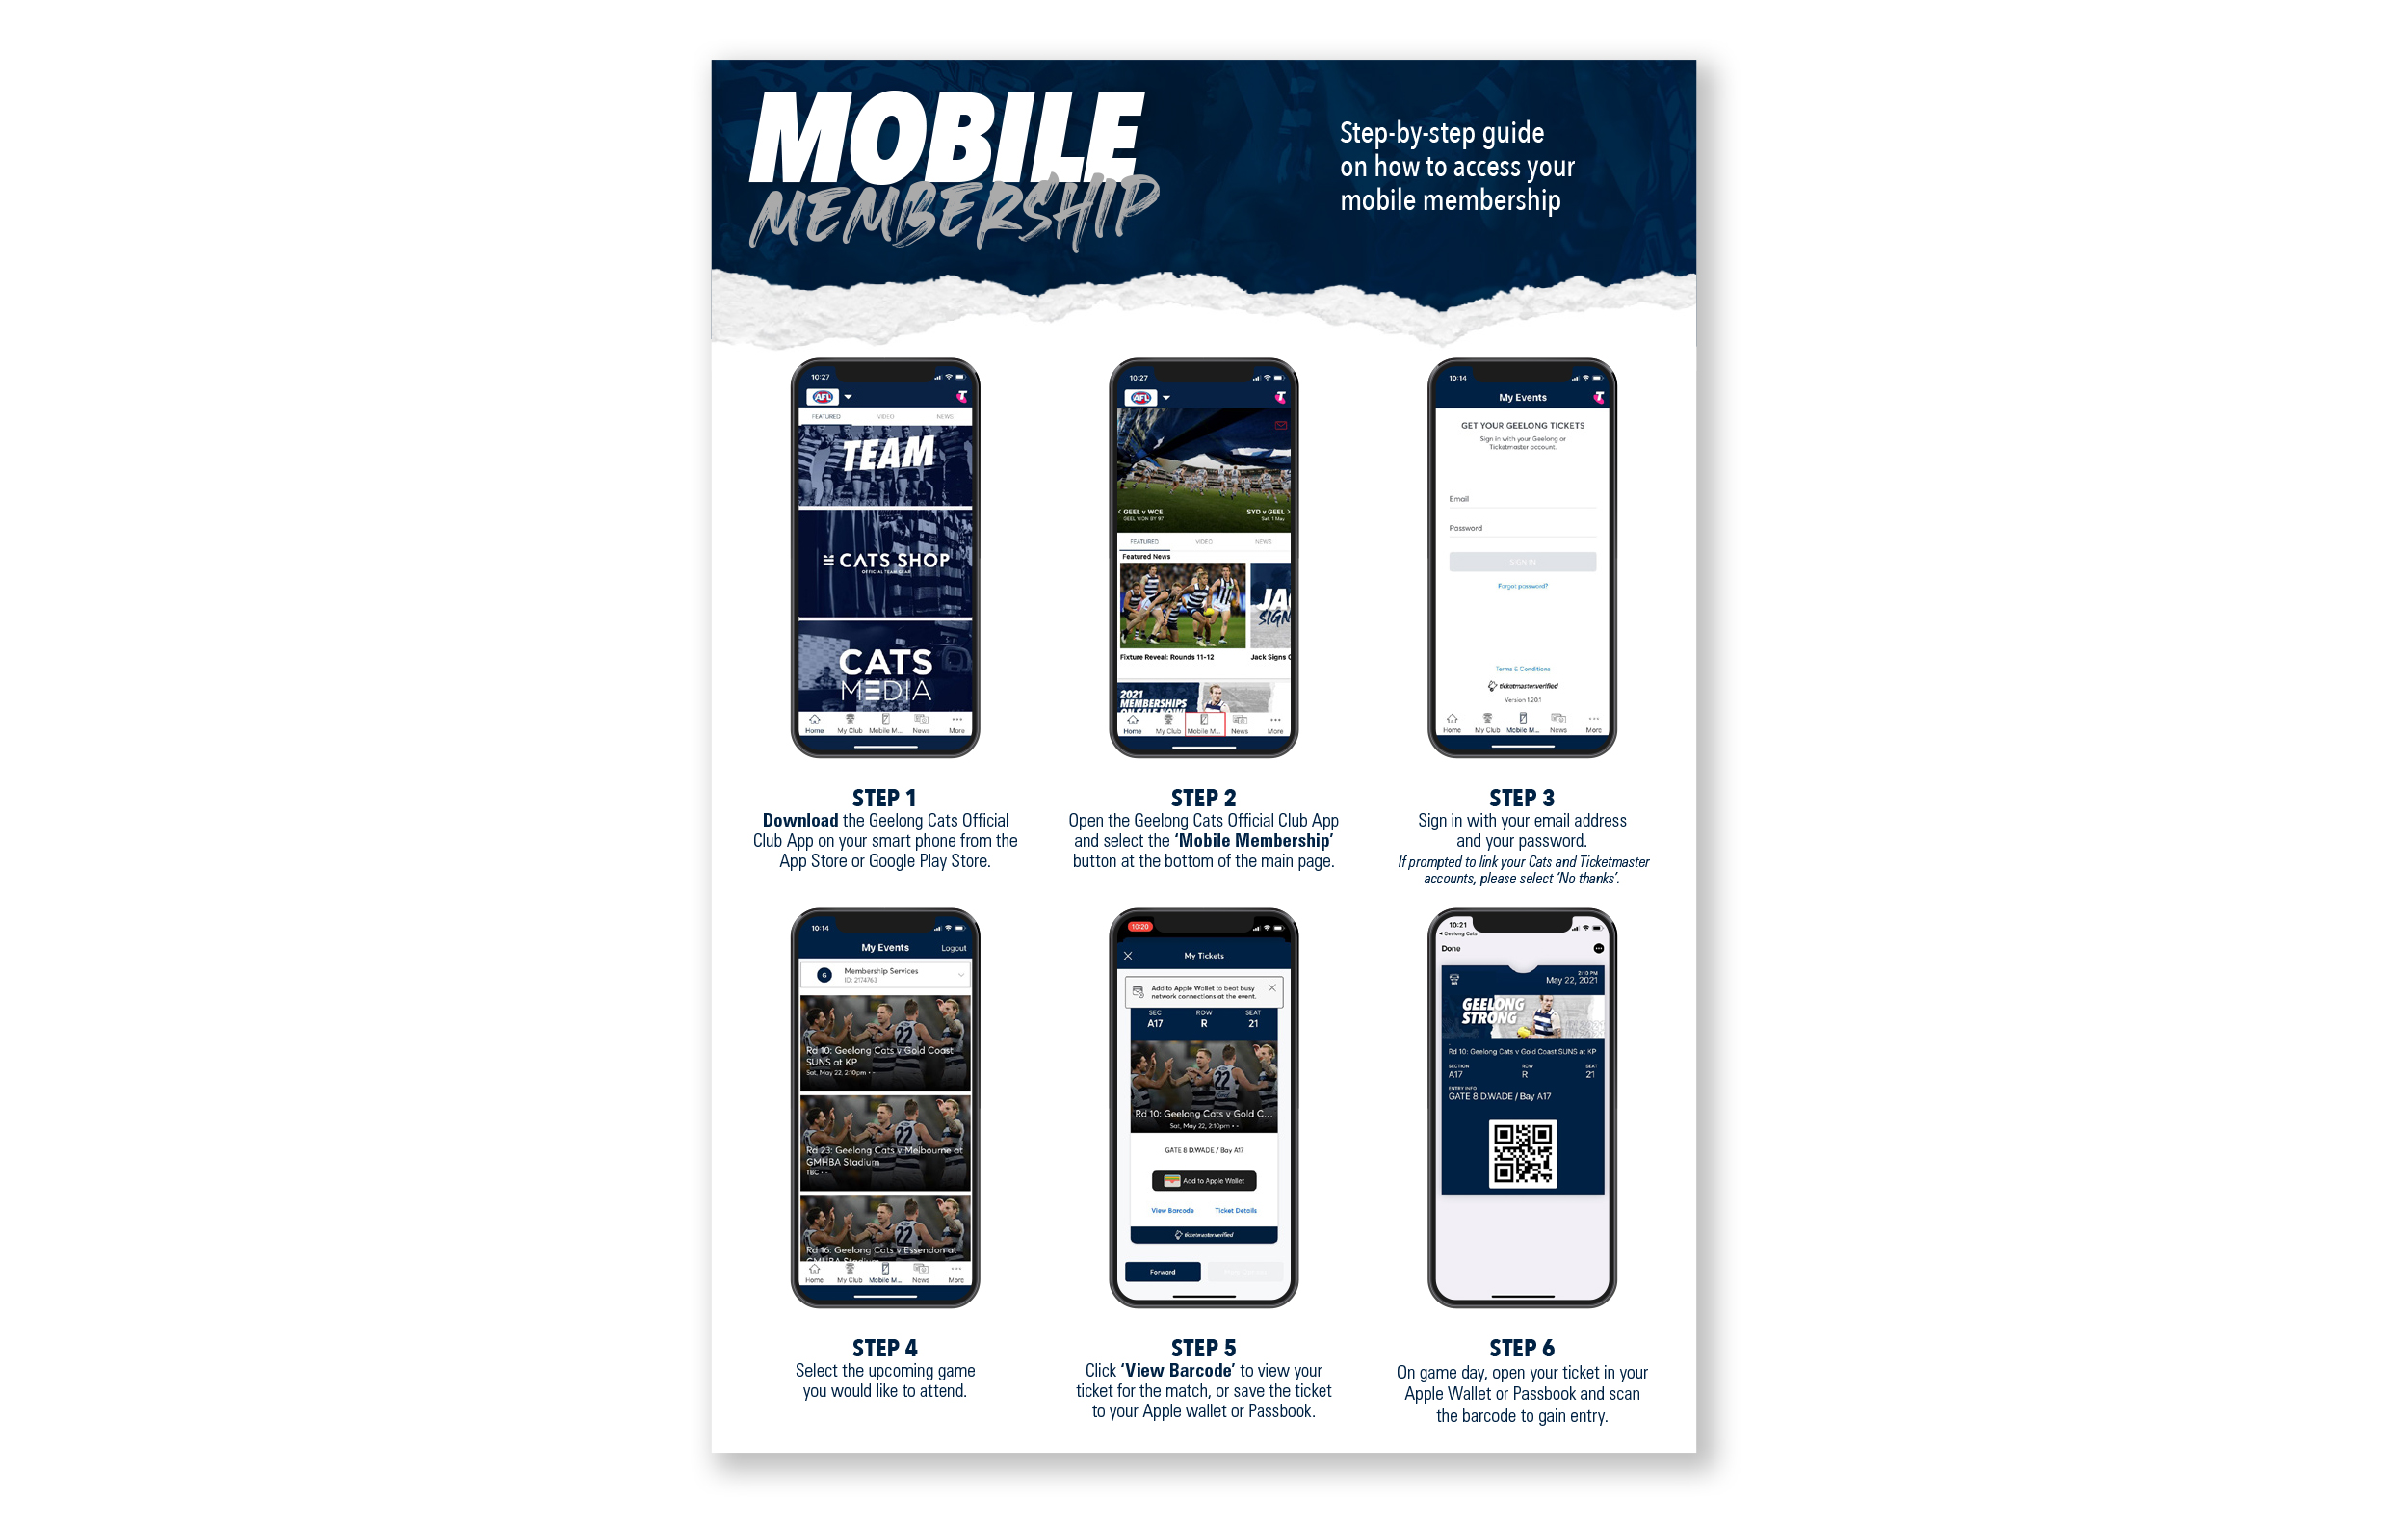 How to use mobile membership